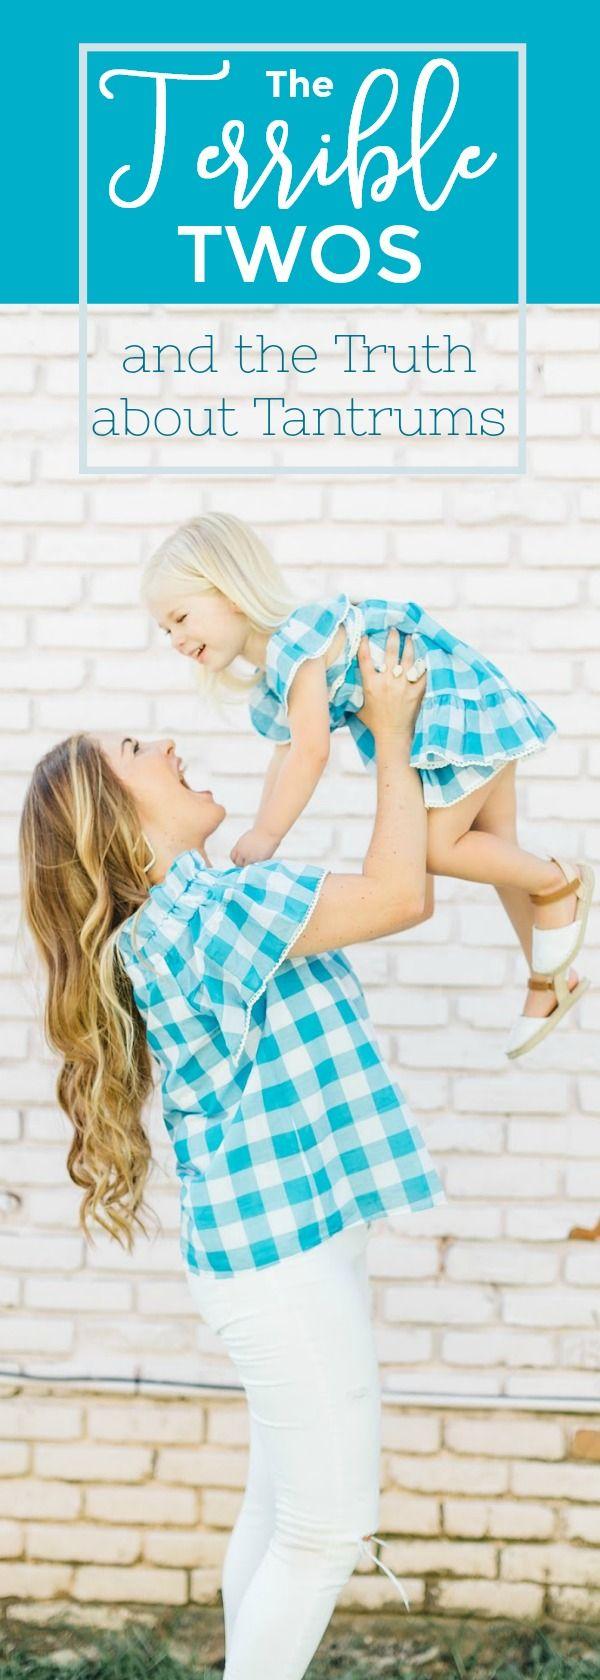 202 best Motherhood & Family. images on Pinterest   Parenting ...